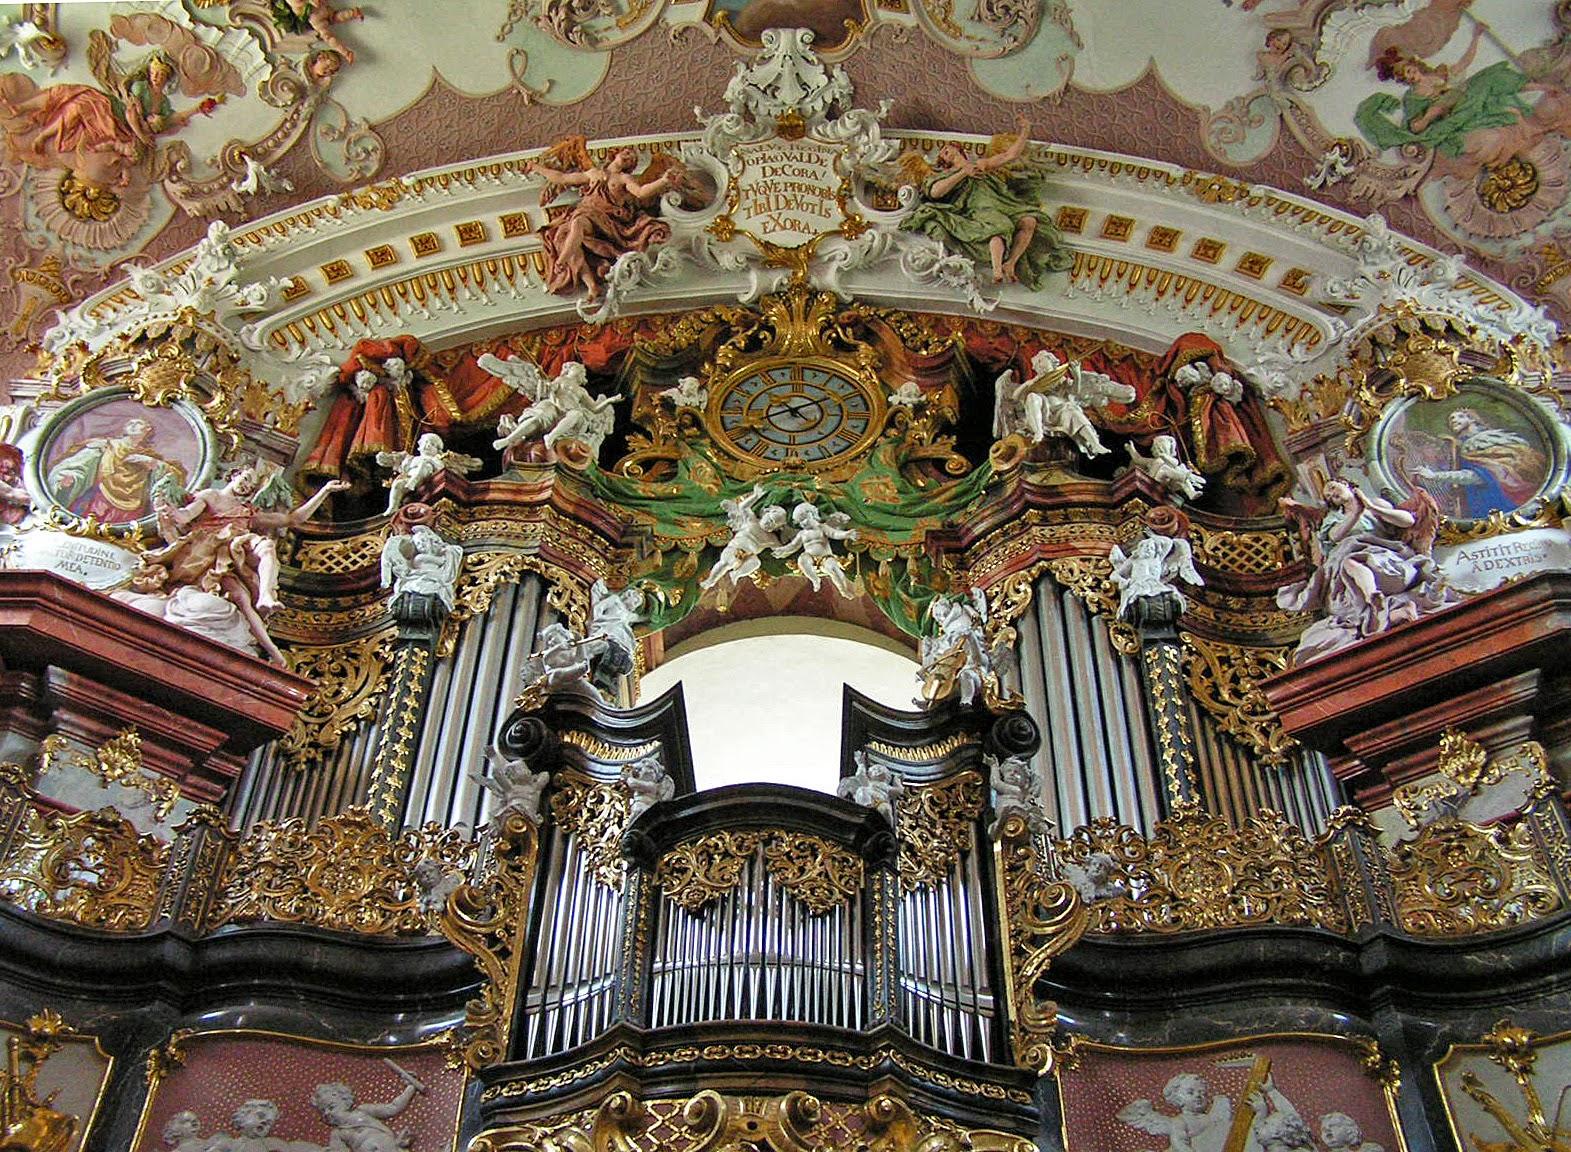 baroque et rococo le monast re de wilhering pr s de linz autriche. Black Bedroom Furniture Sets. Home Design Ideas